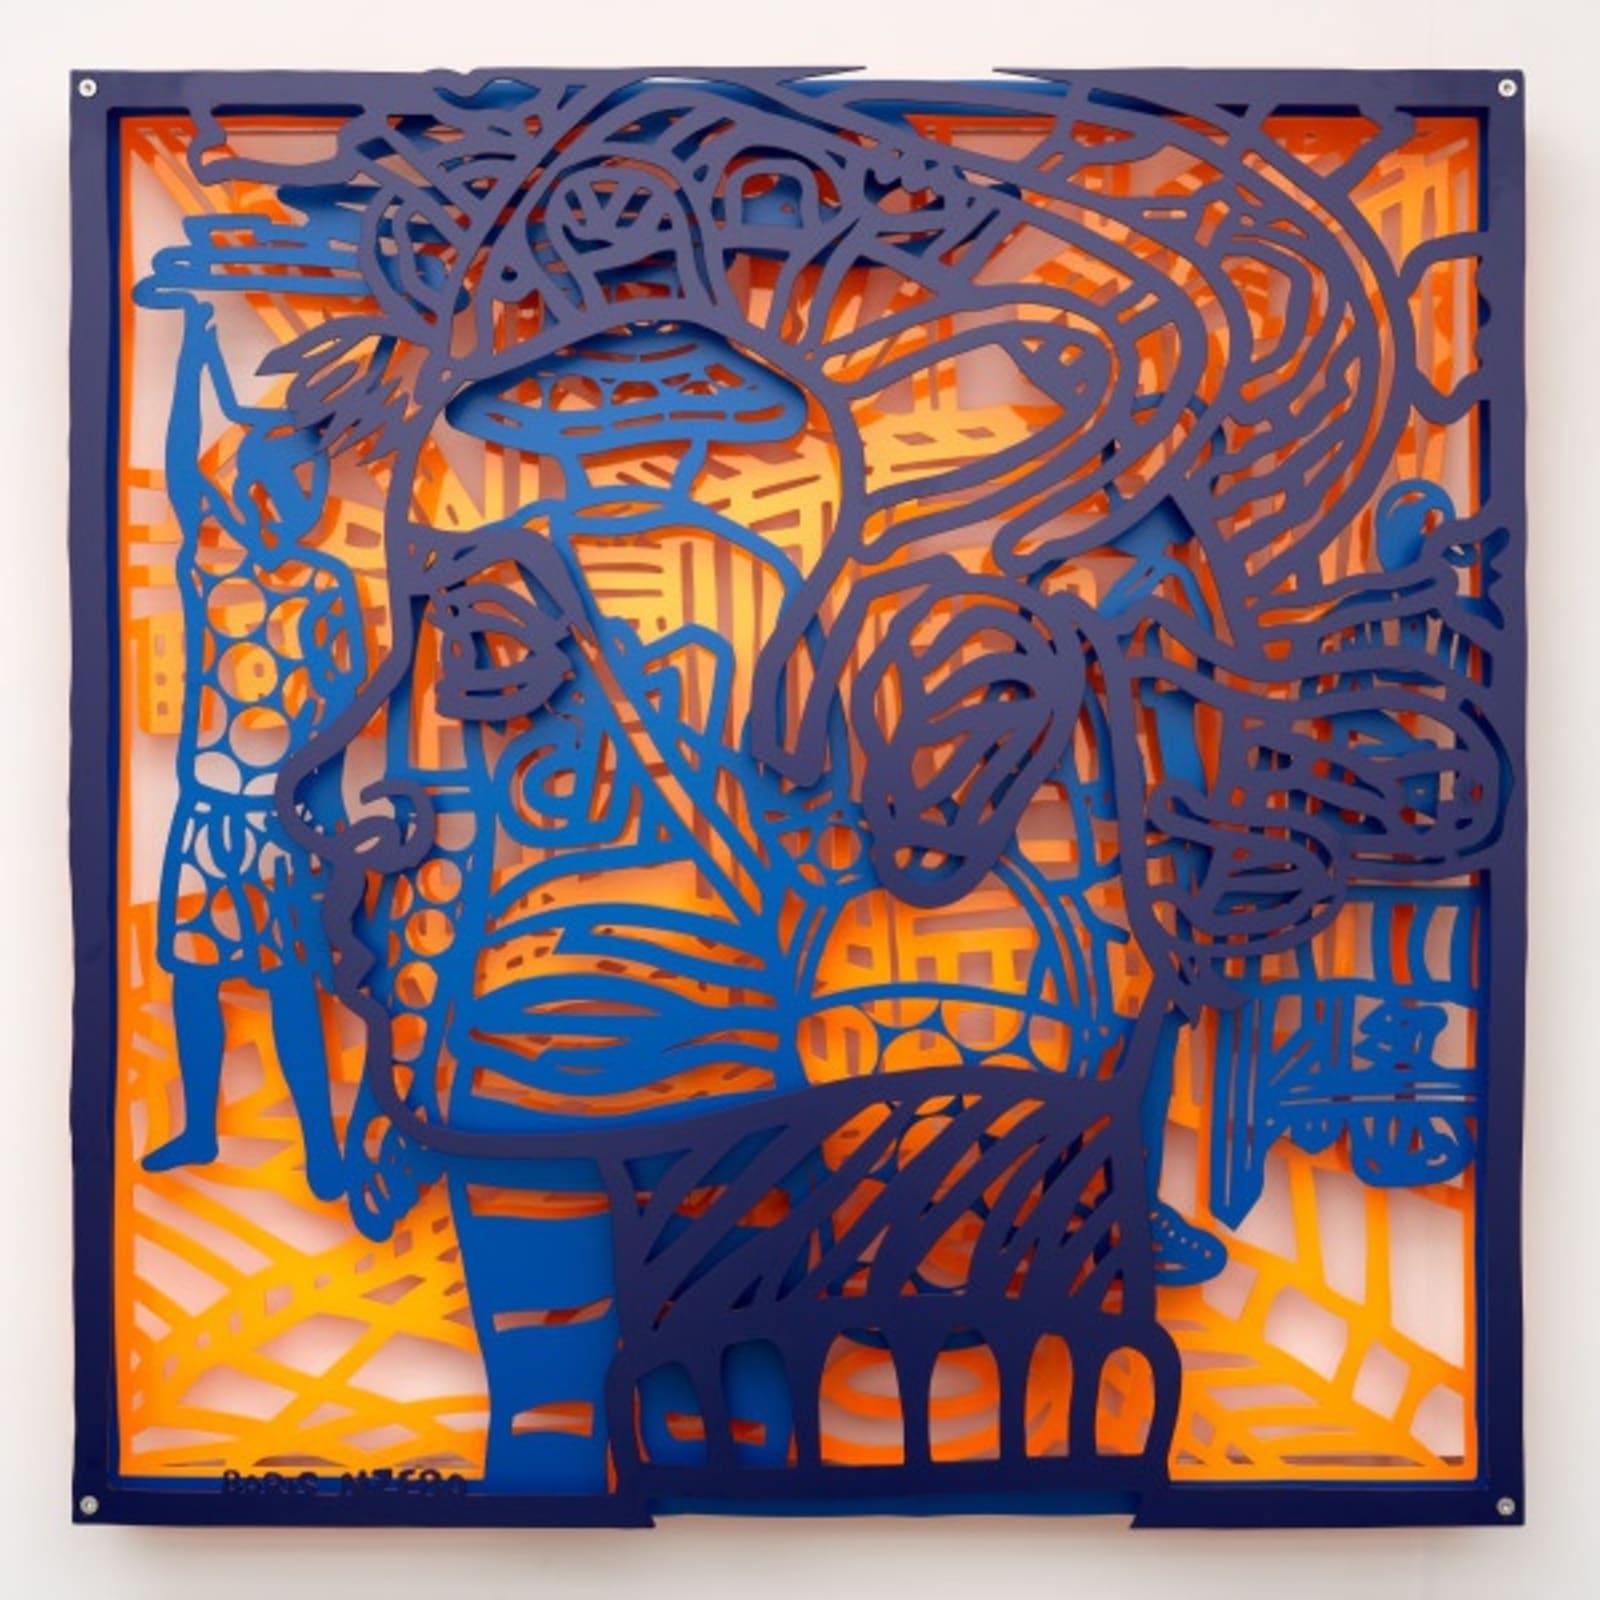 Boris Nzebo, Speed Demon 1, 2019 Powder coated aluminum 122.5 x 122.5 cm Edition of 6 (#3/6)